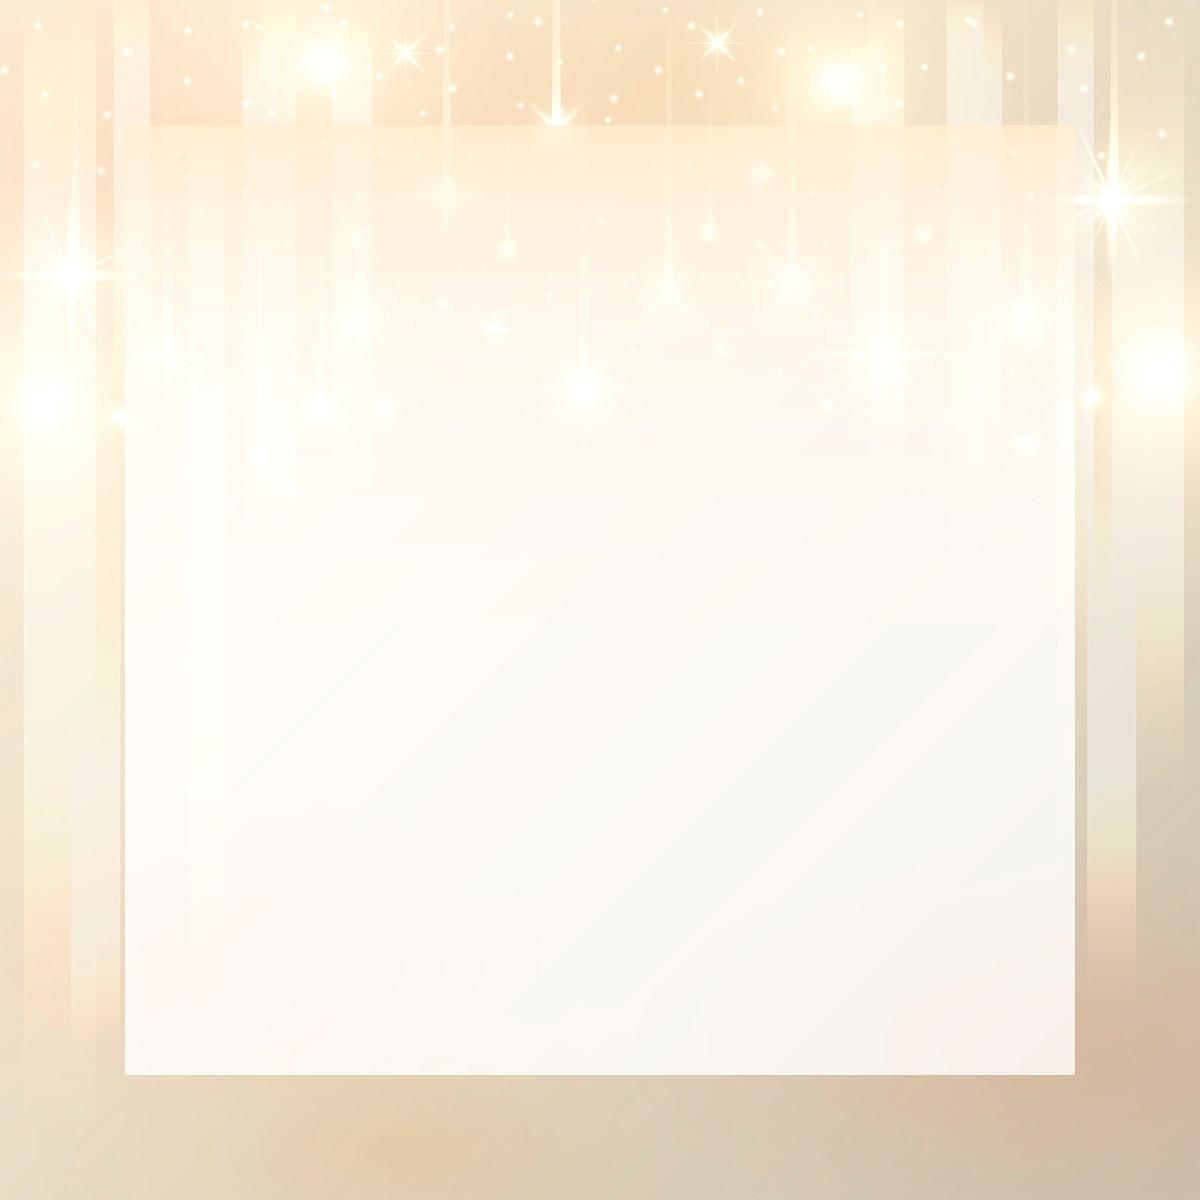 Square gold frame background vector